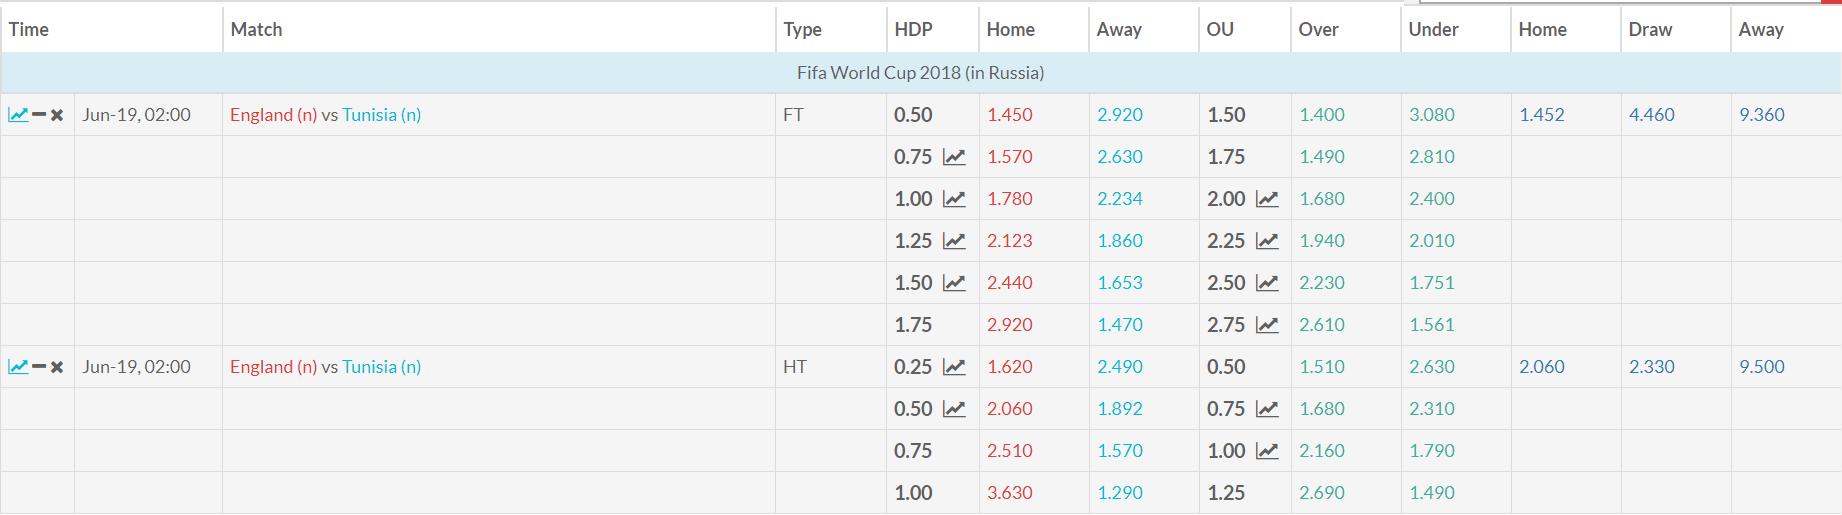 Tunisia v England Match Betting Odds